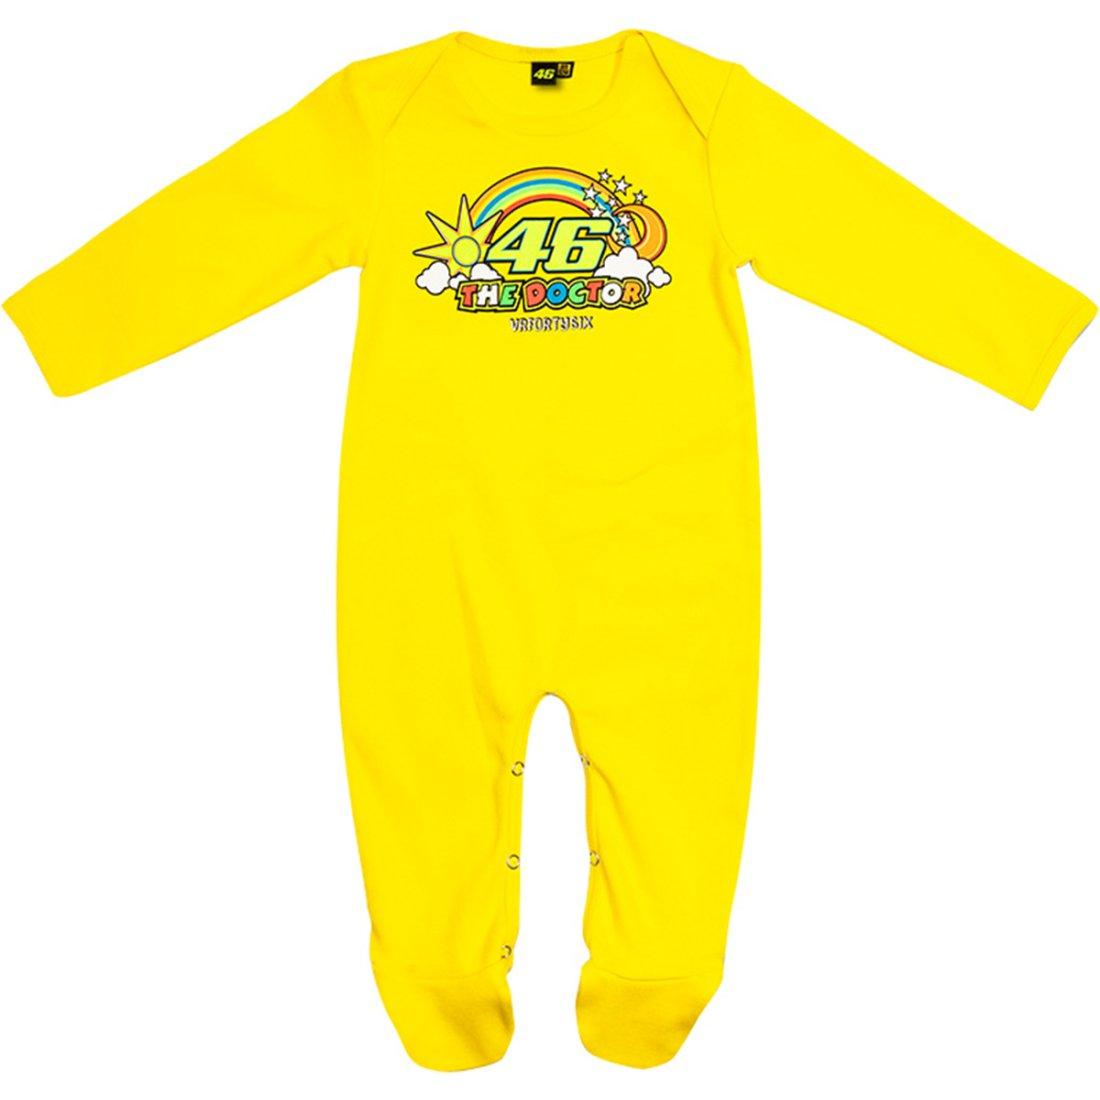 VR46 Rossi VR 46 151301 Baby Overall Y Pyjamas · Motocard ad6714deb5b